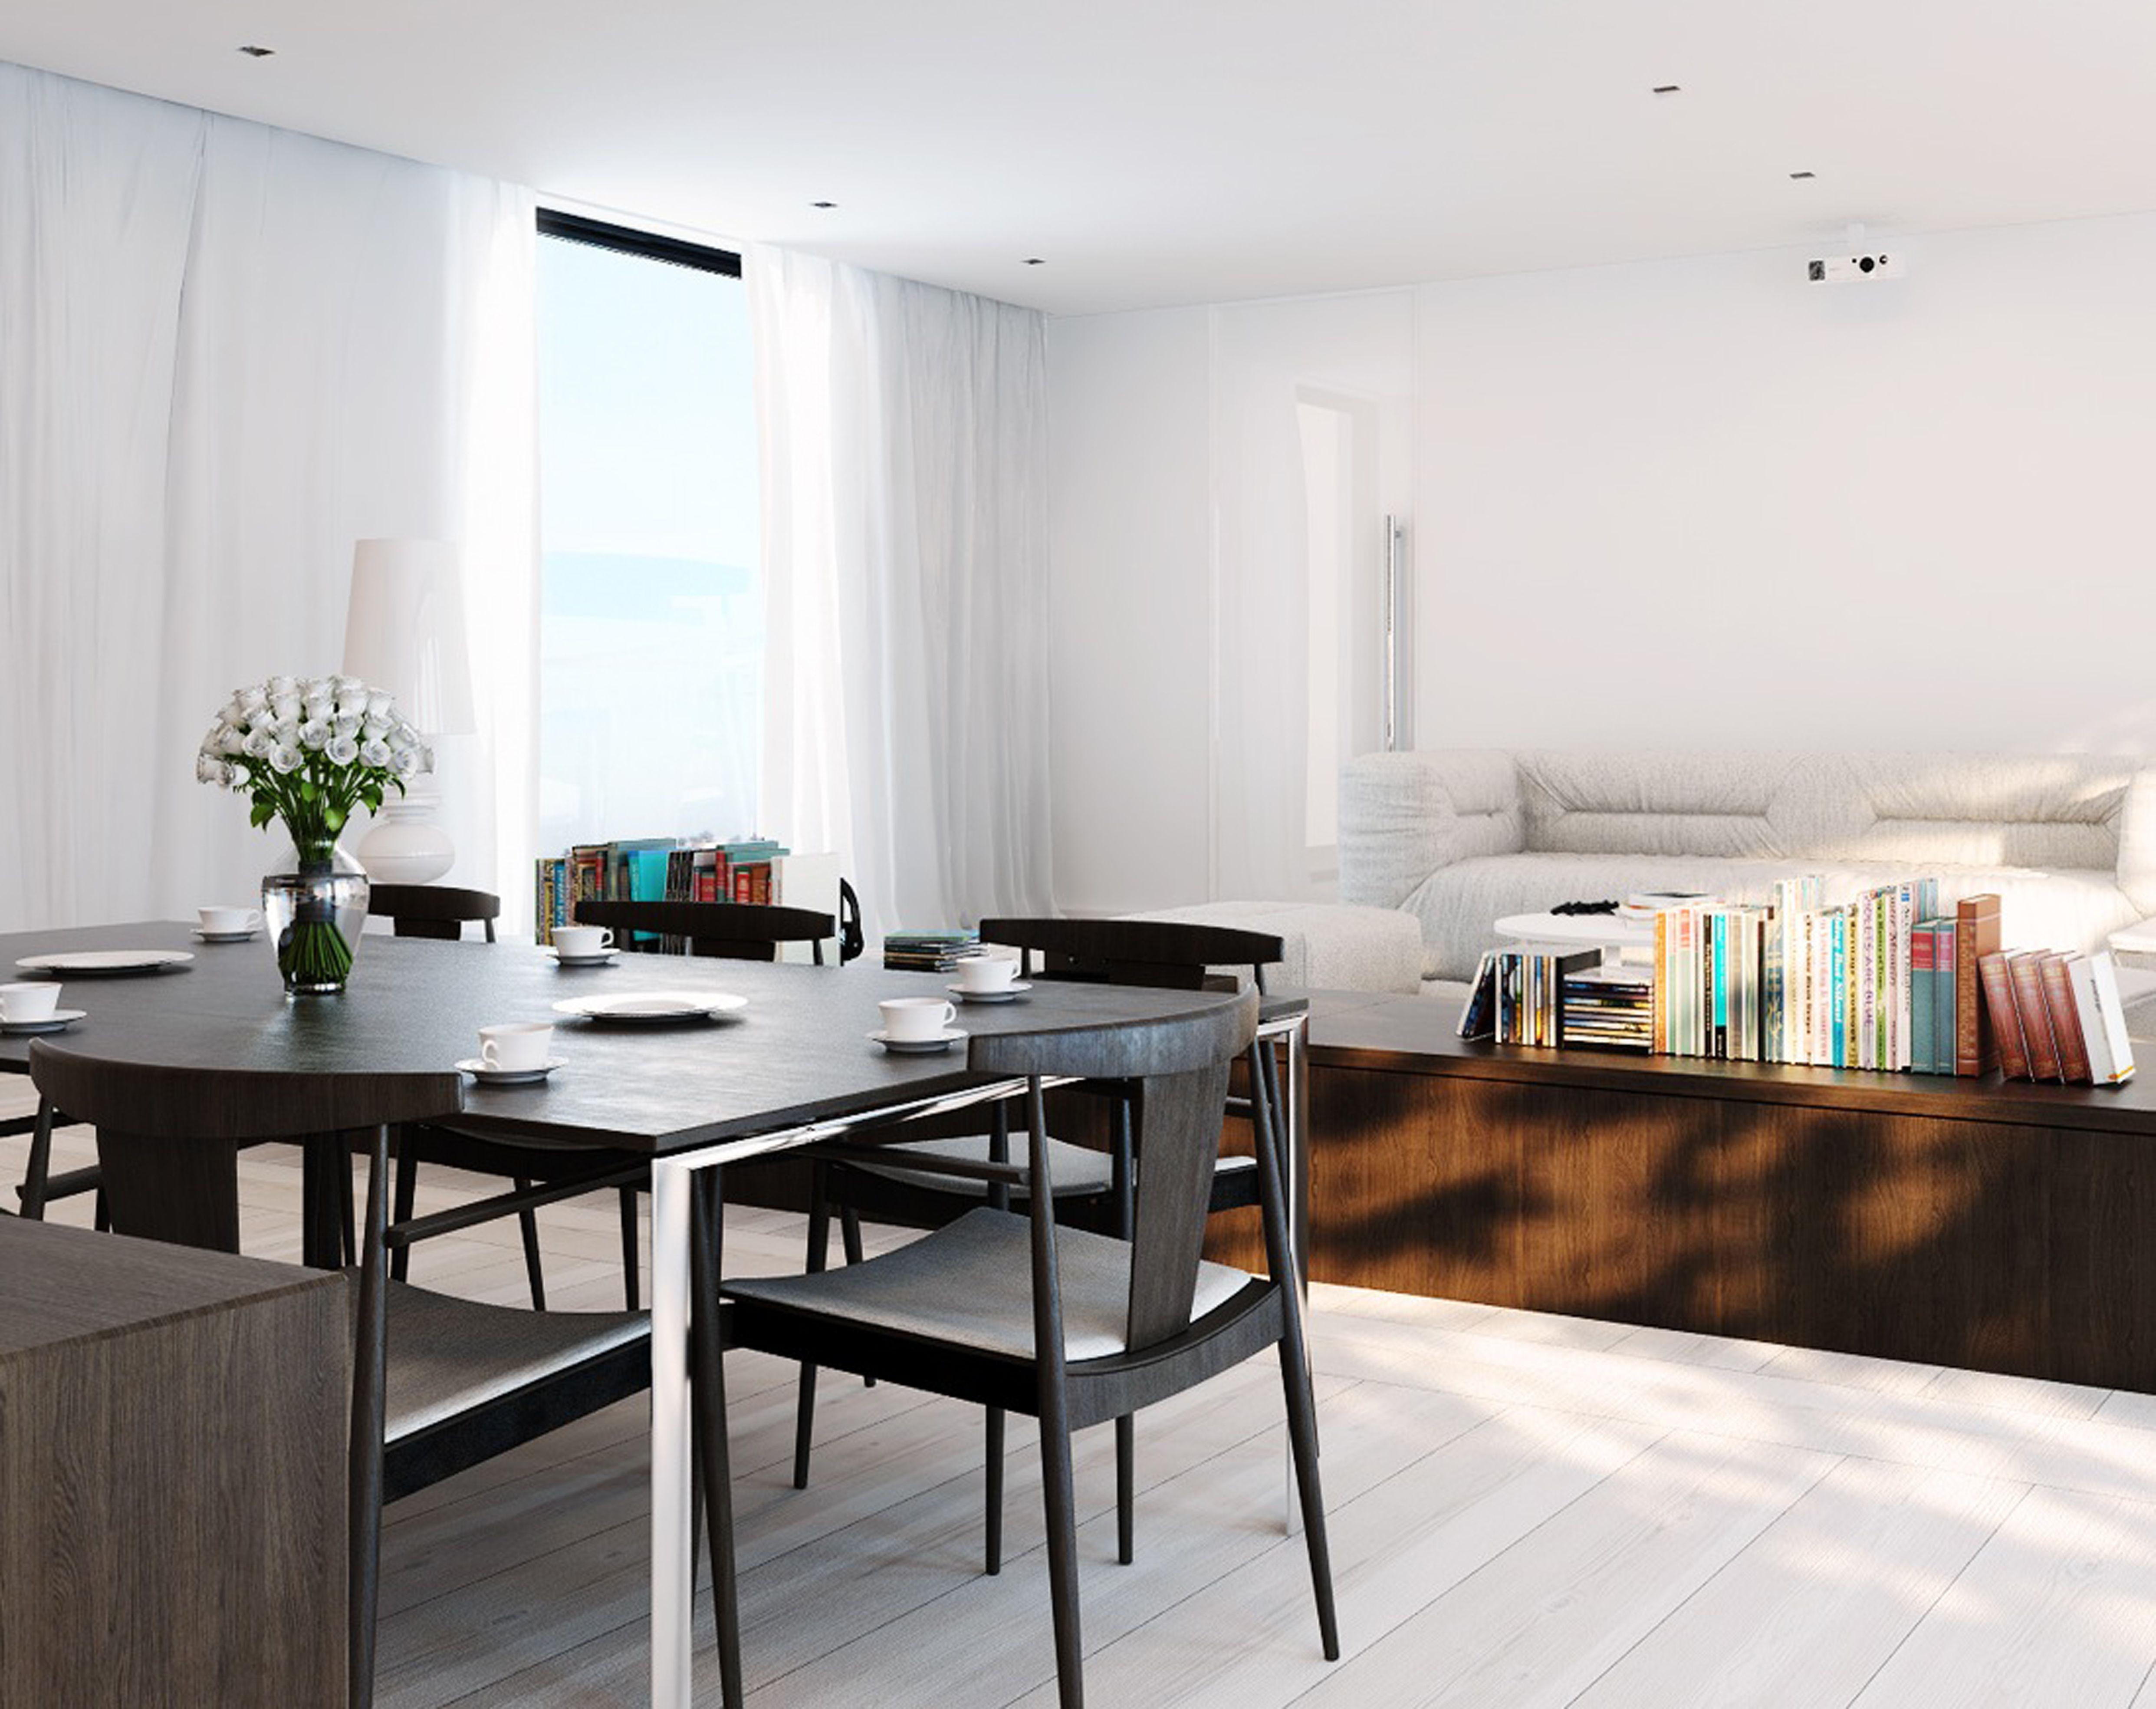 Dining Room Sets Houston Texas Custom Table Pads Dining Room Tables Kitchen  And Dining Room Designs